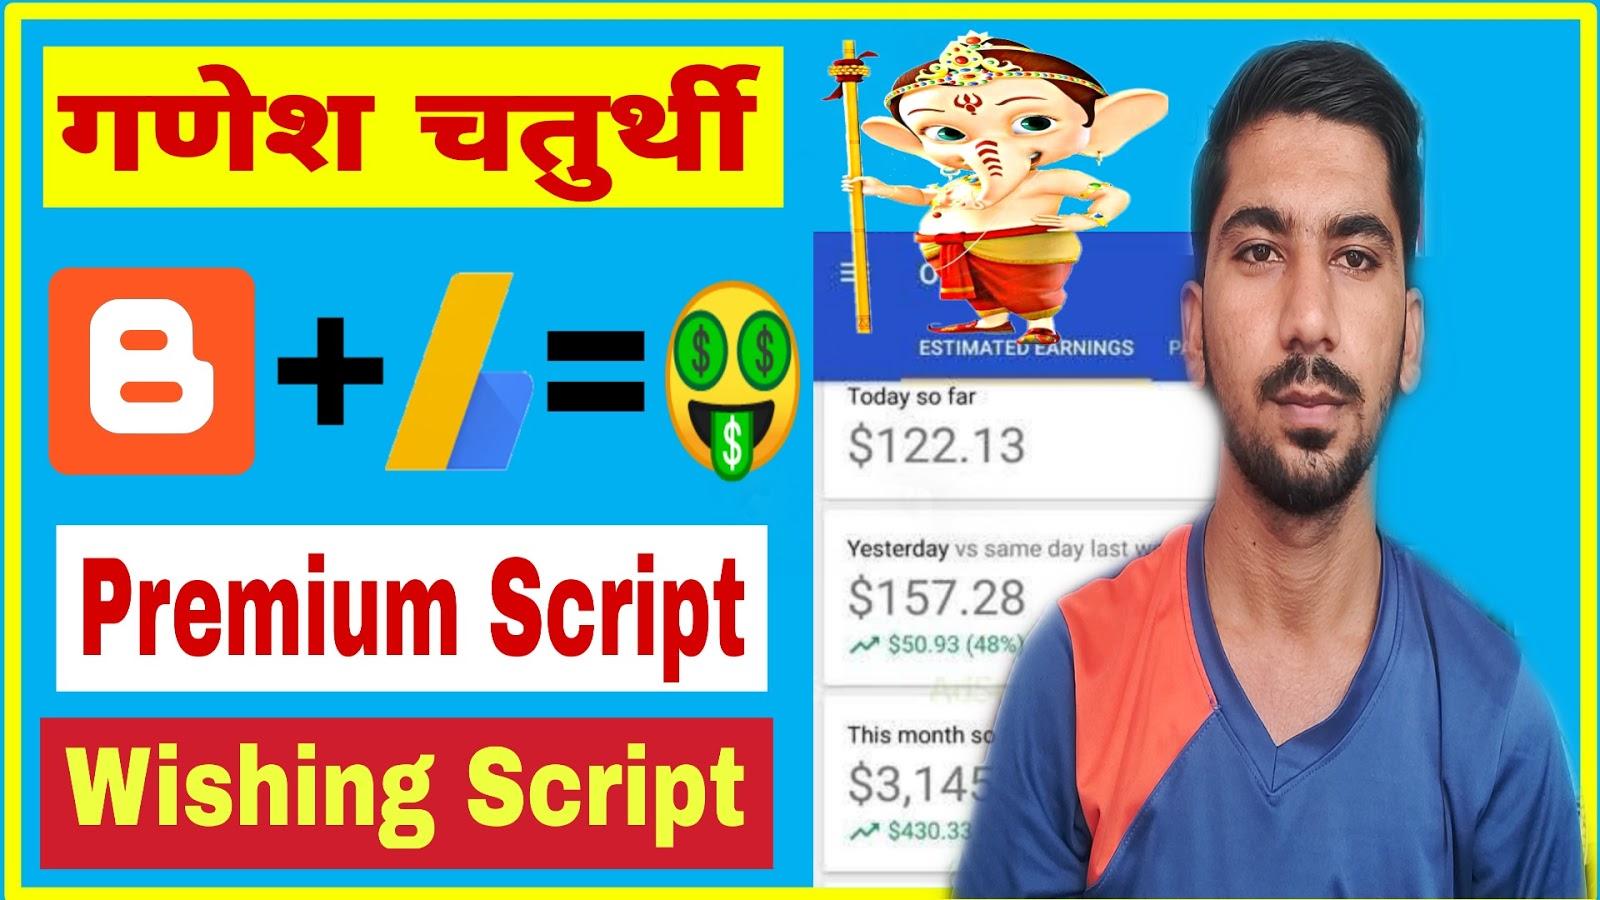 Ganesh Chaturthi Wishing Script 2020